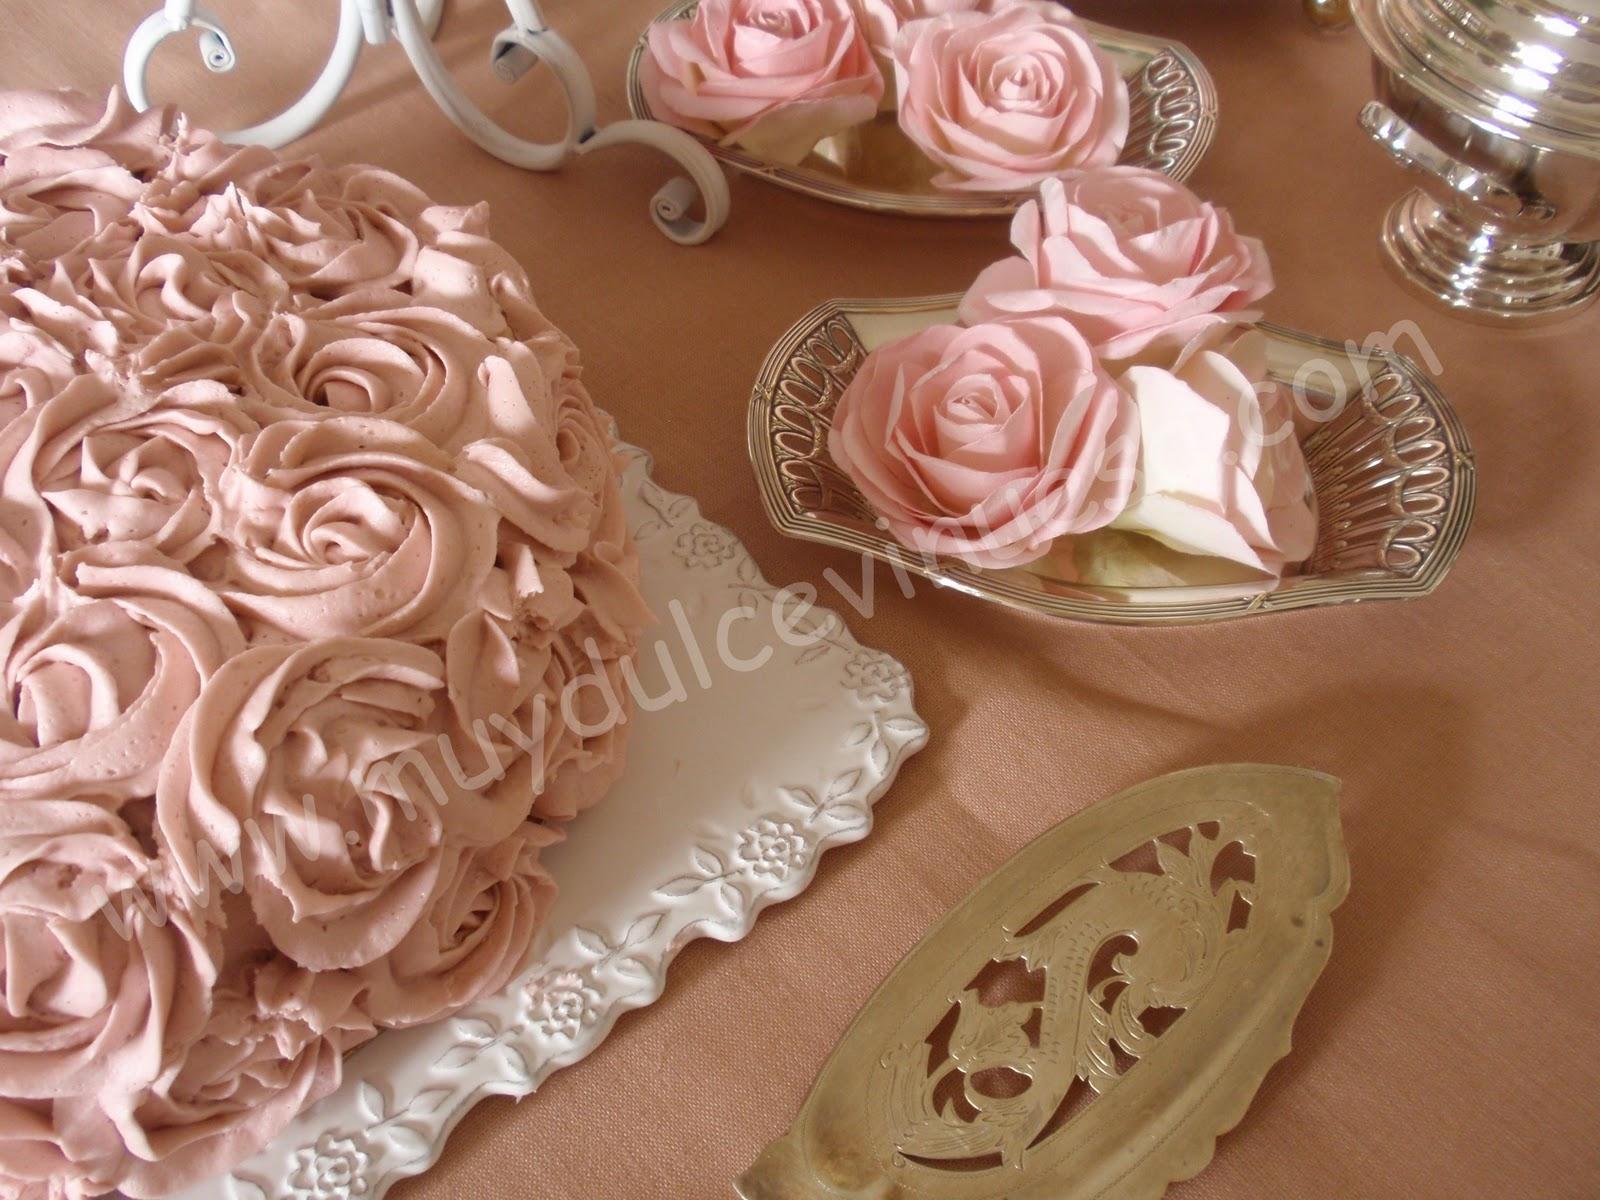 Muy dulce mariapi y mercedes garcia de vinuesa - Objetivo cupcake perfecto blog ...